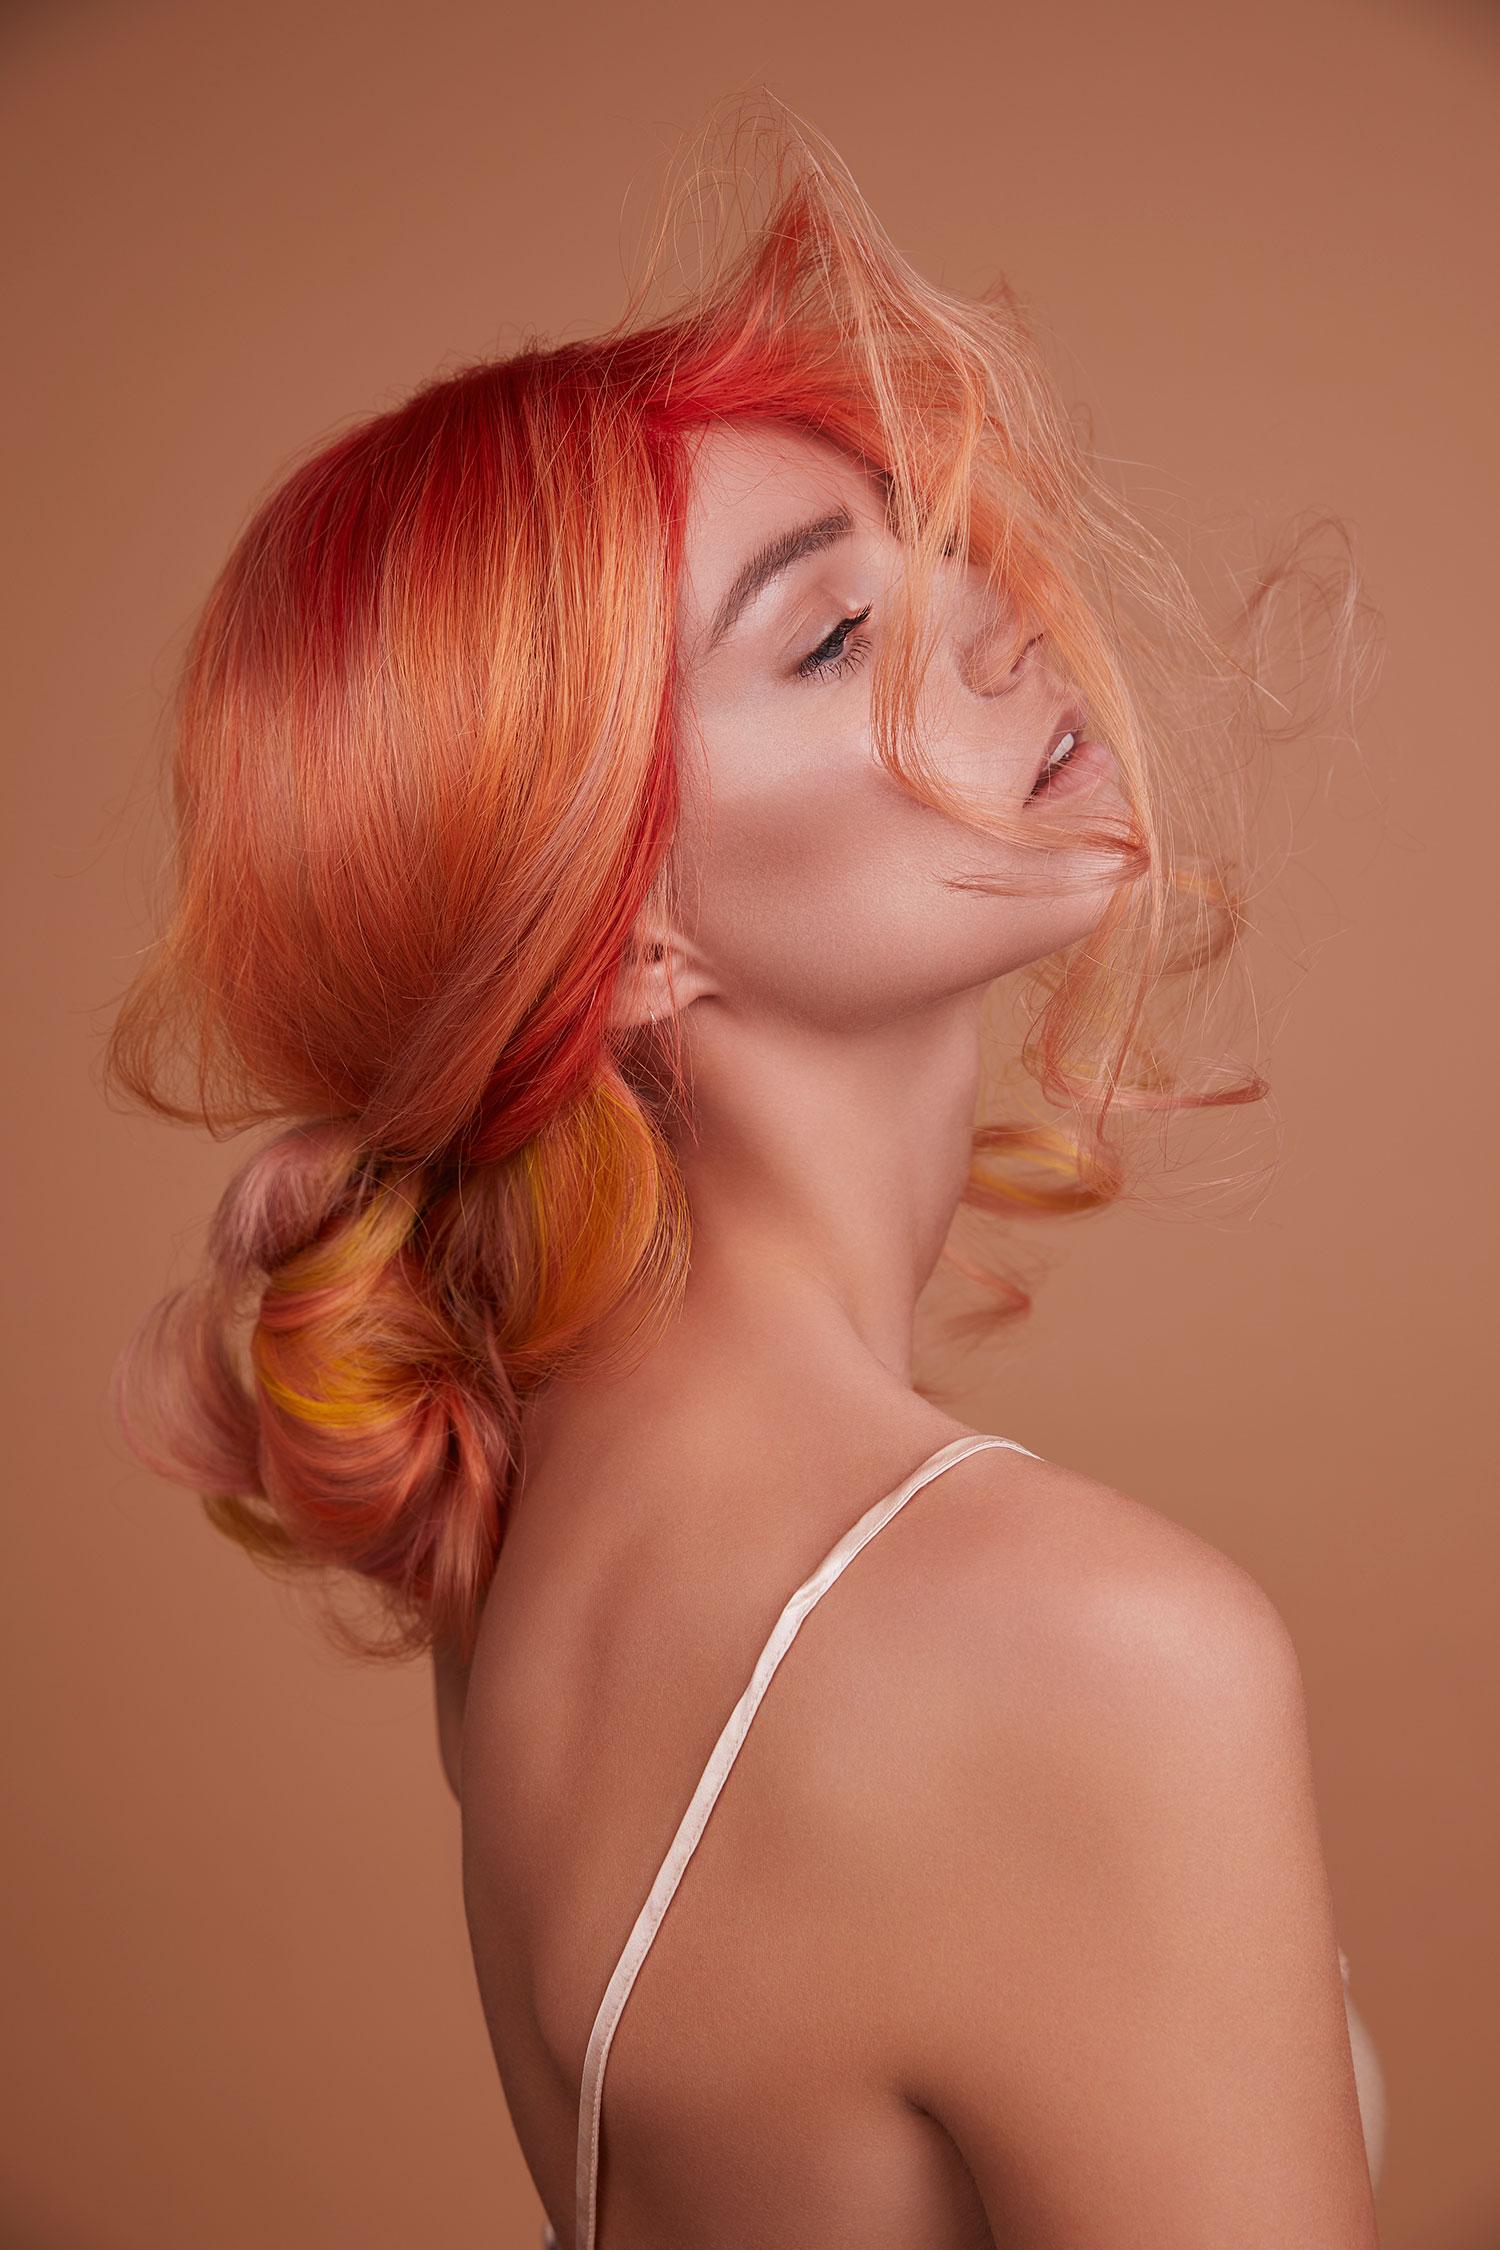 pantone+colour+of+the+year+hairdresser+living+coral+peach+pastel+farbe+wien+balayage+farbspezialist+ahda+austrian+award+lizzy+lemon+ginger+wien+1060+friseur+makeup+felix+rachor.jpeg